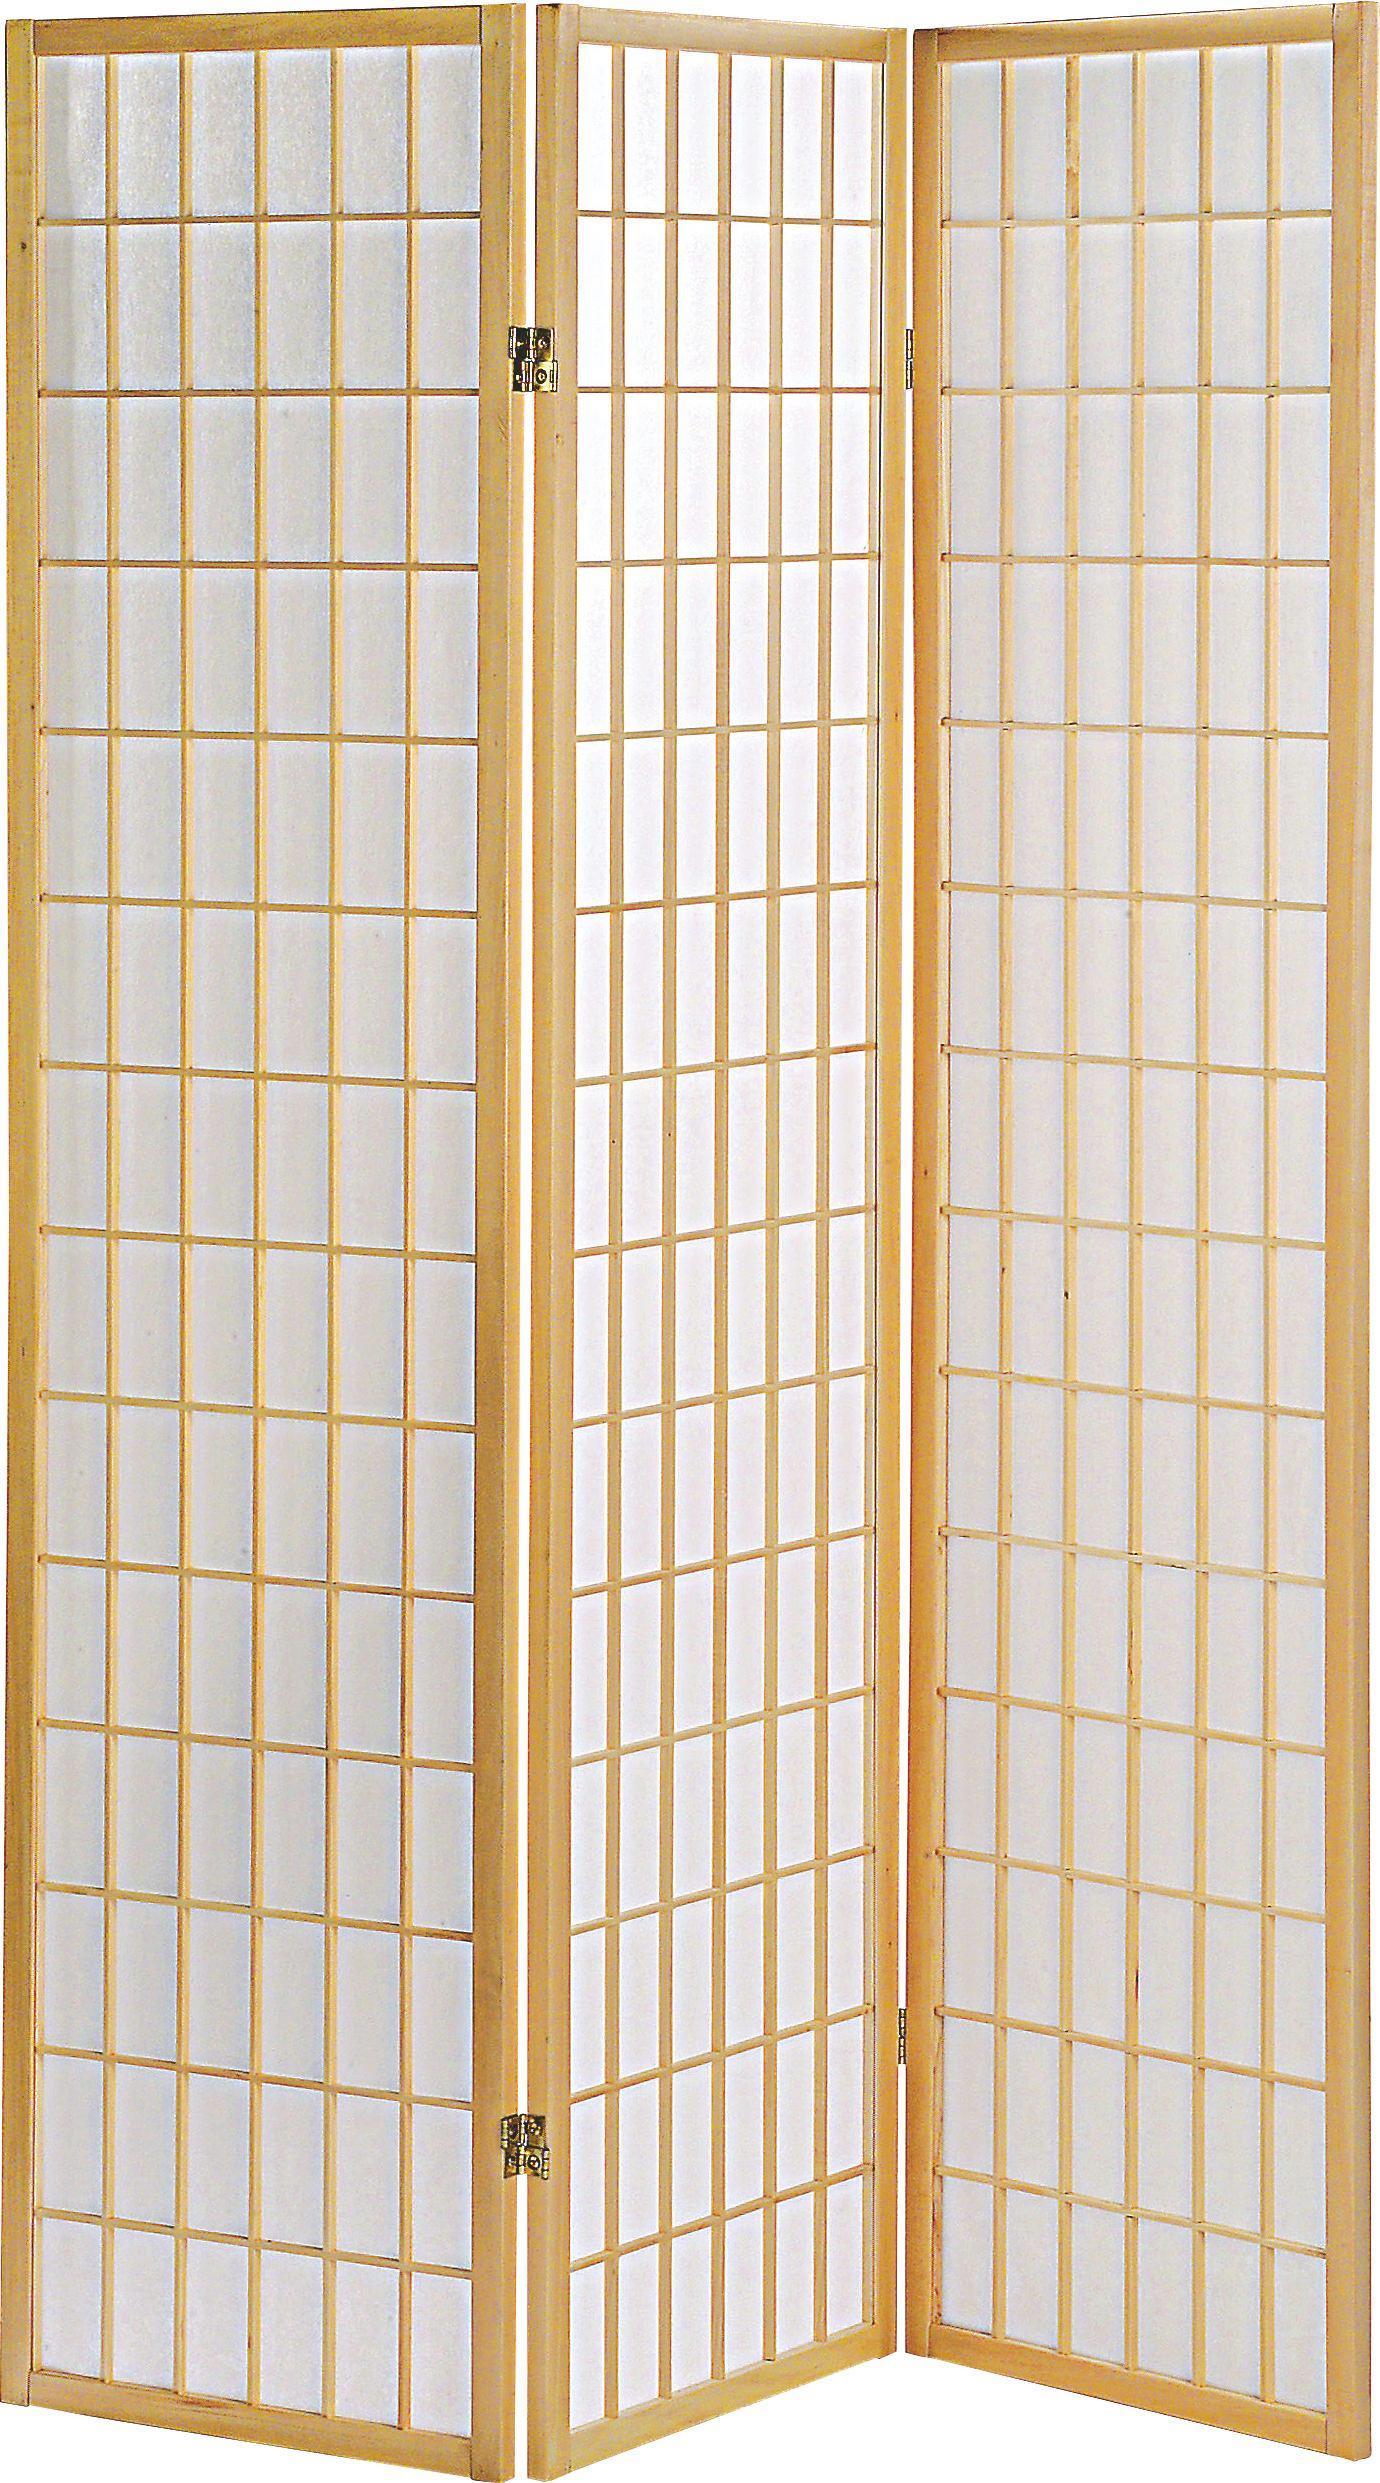 Paravent in Naturfarben - Naturfarben, Holz/Papier (131/179/2cm) - MÖMAX modern living